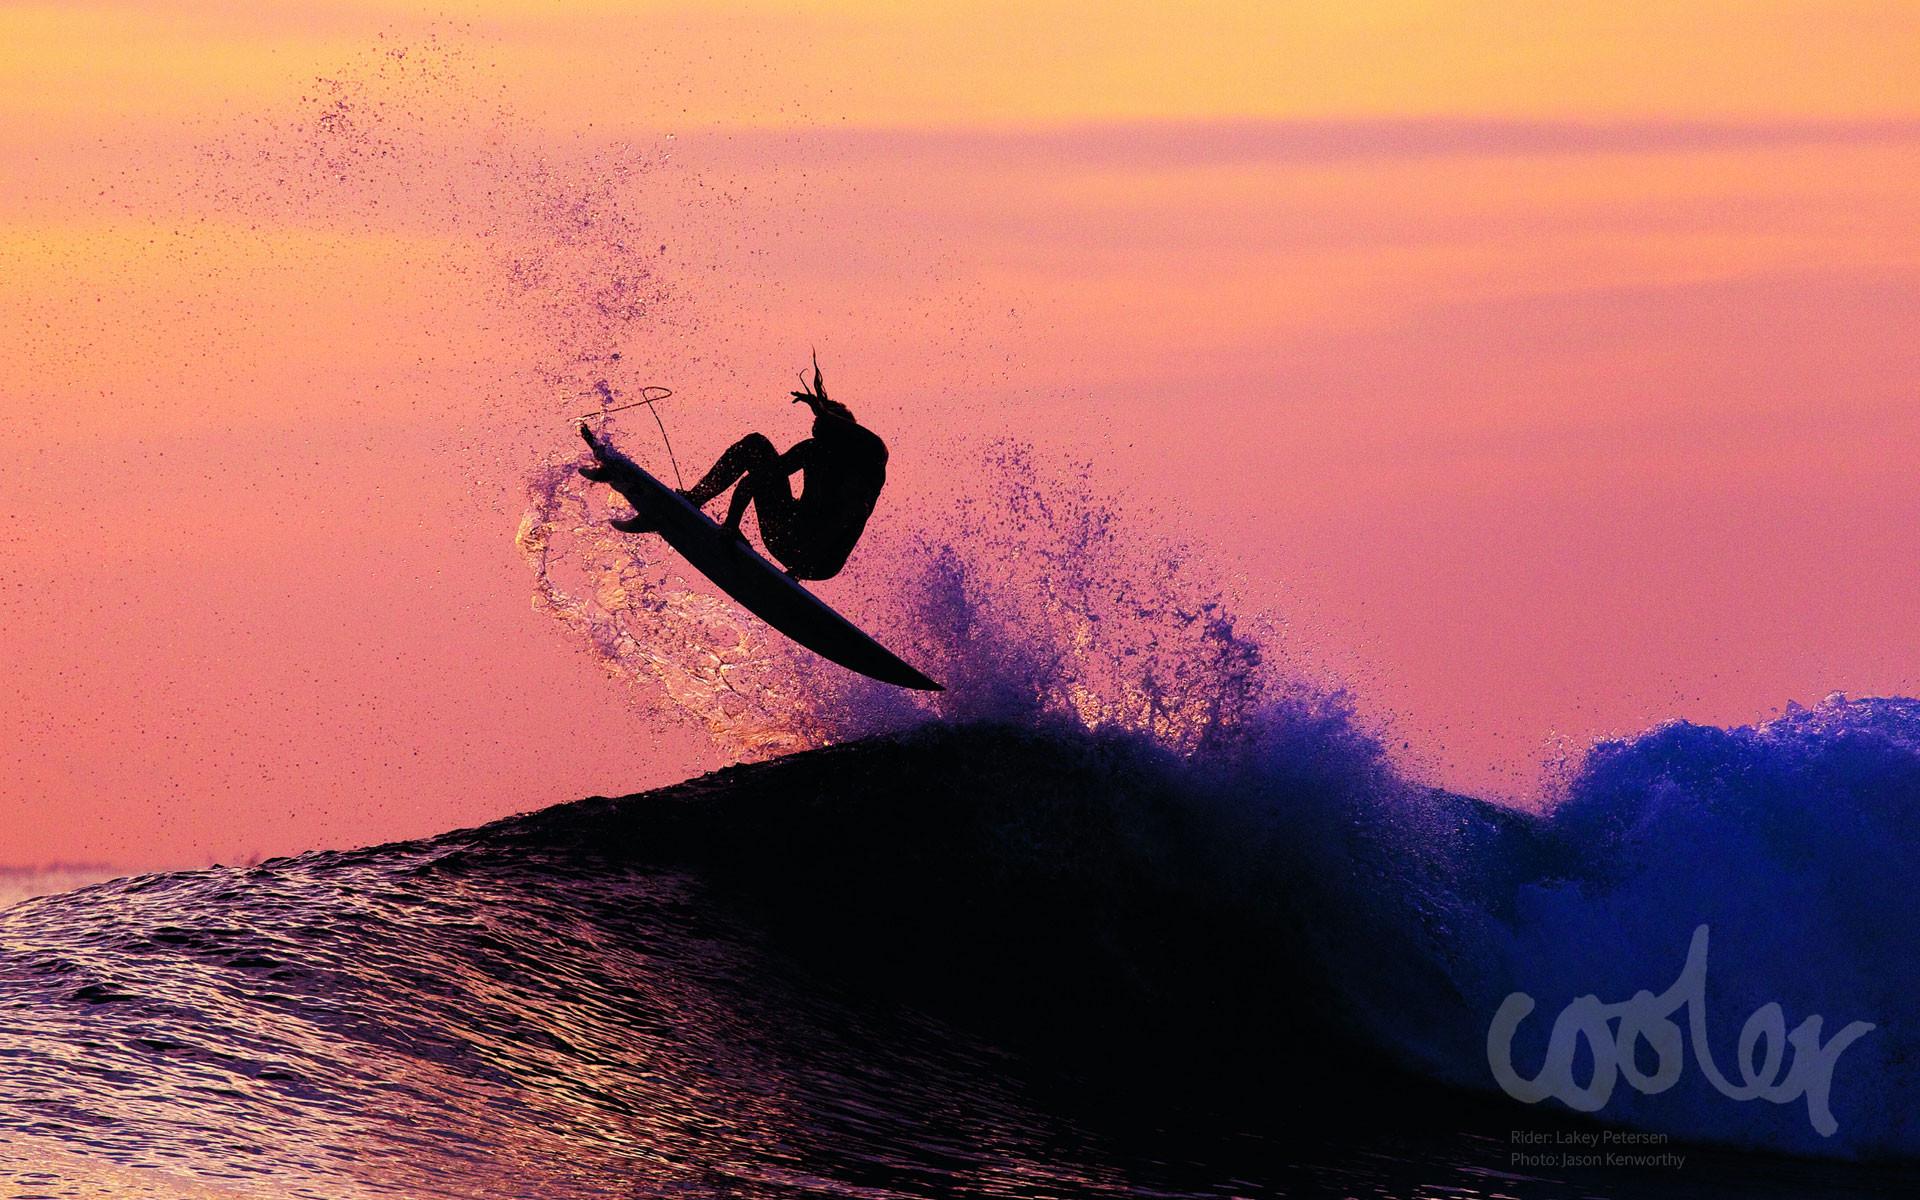 Surfing Girl Iphone Wallpaper Nike Surf Wallpapers 183 ① Wallpapertag